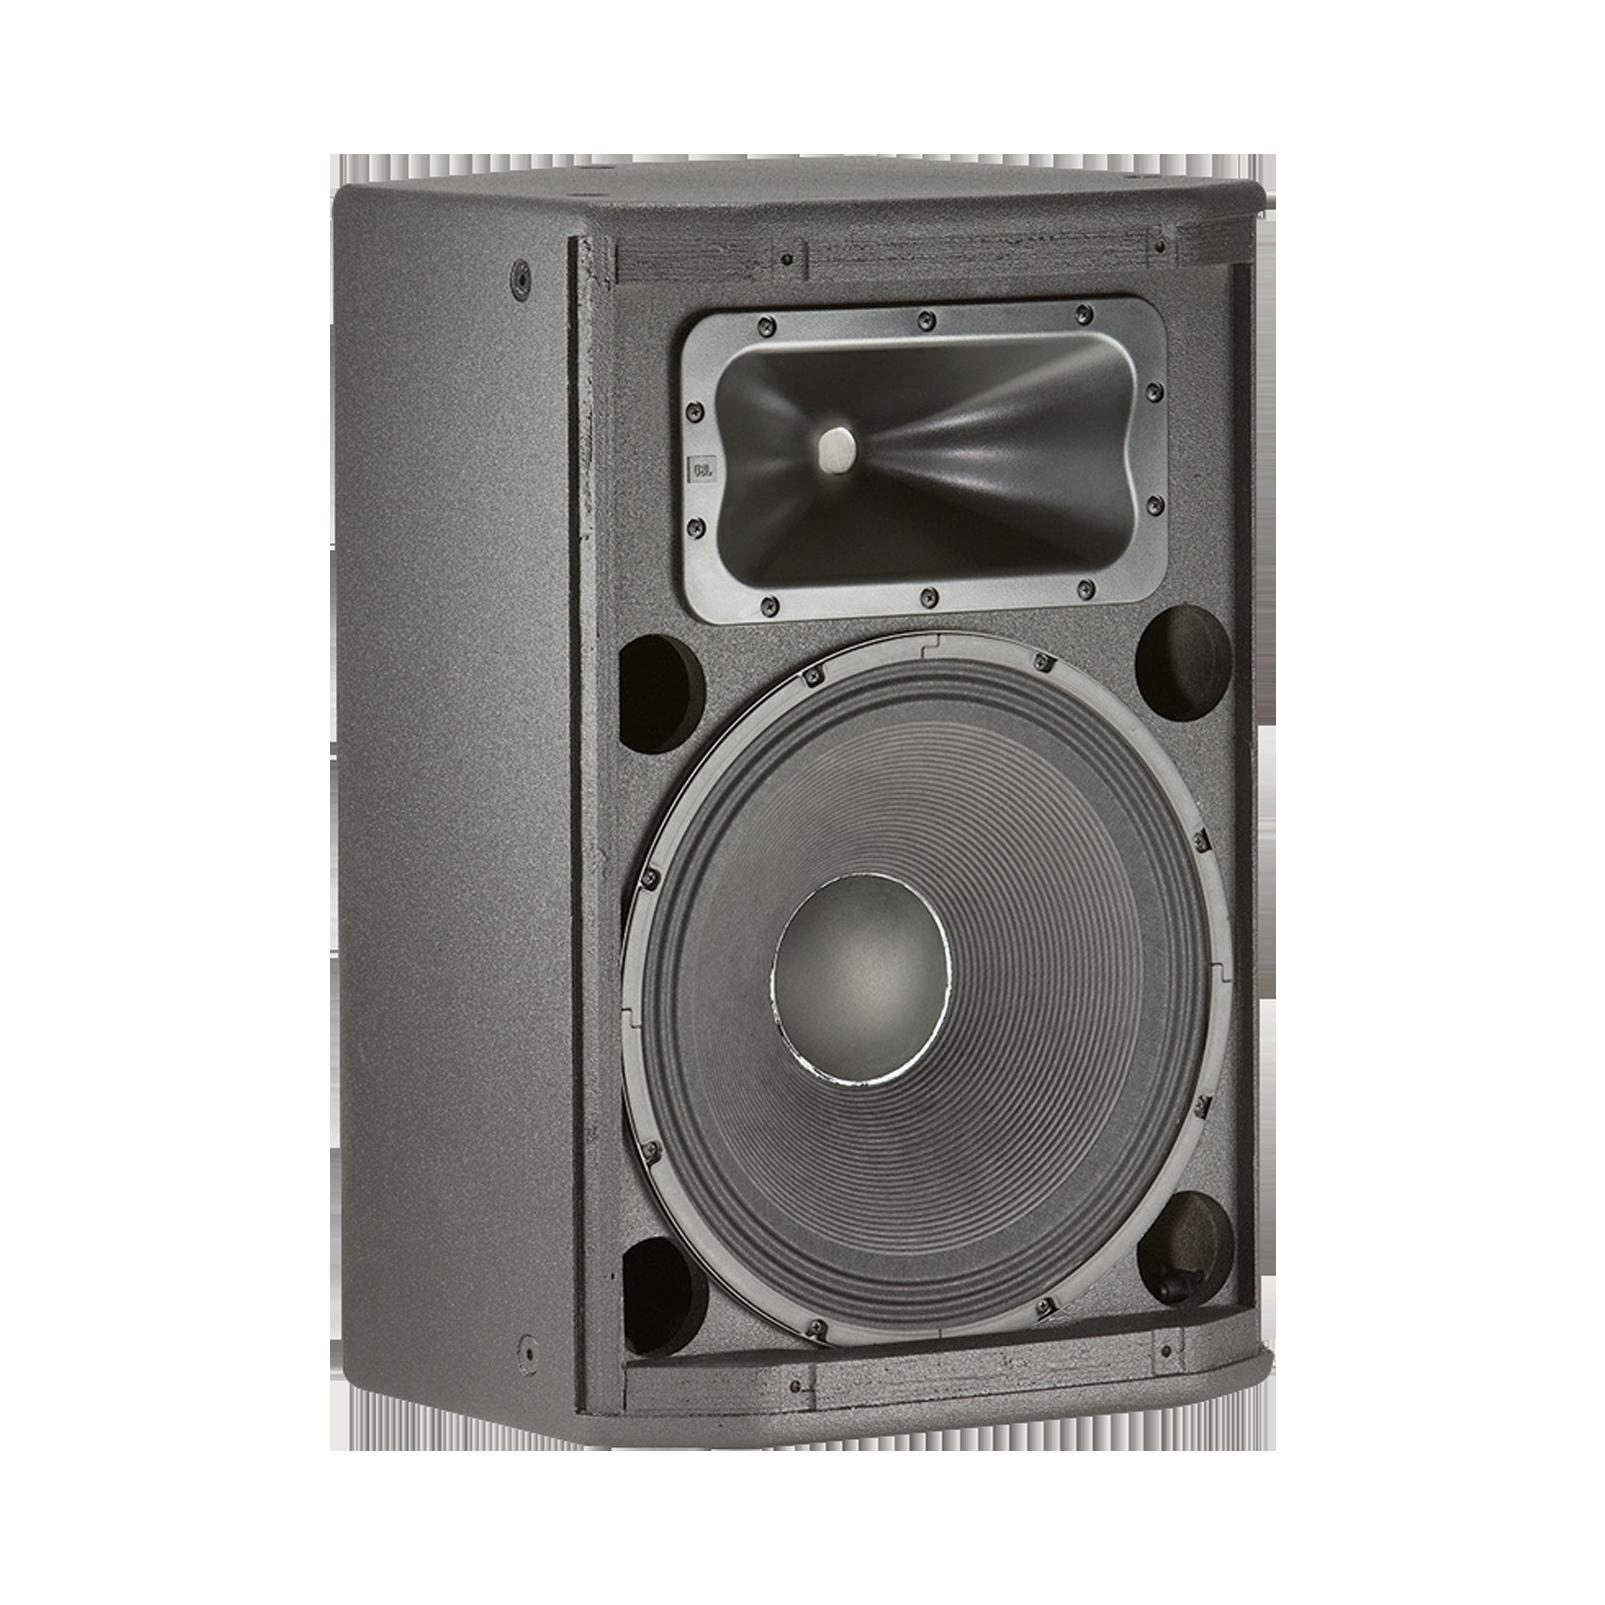 "JBL PRX415M - Black - 15"" Two-Way Stage Monitor and Loudspeaker System - Detailshot 1"